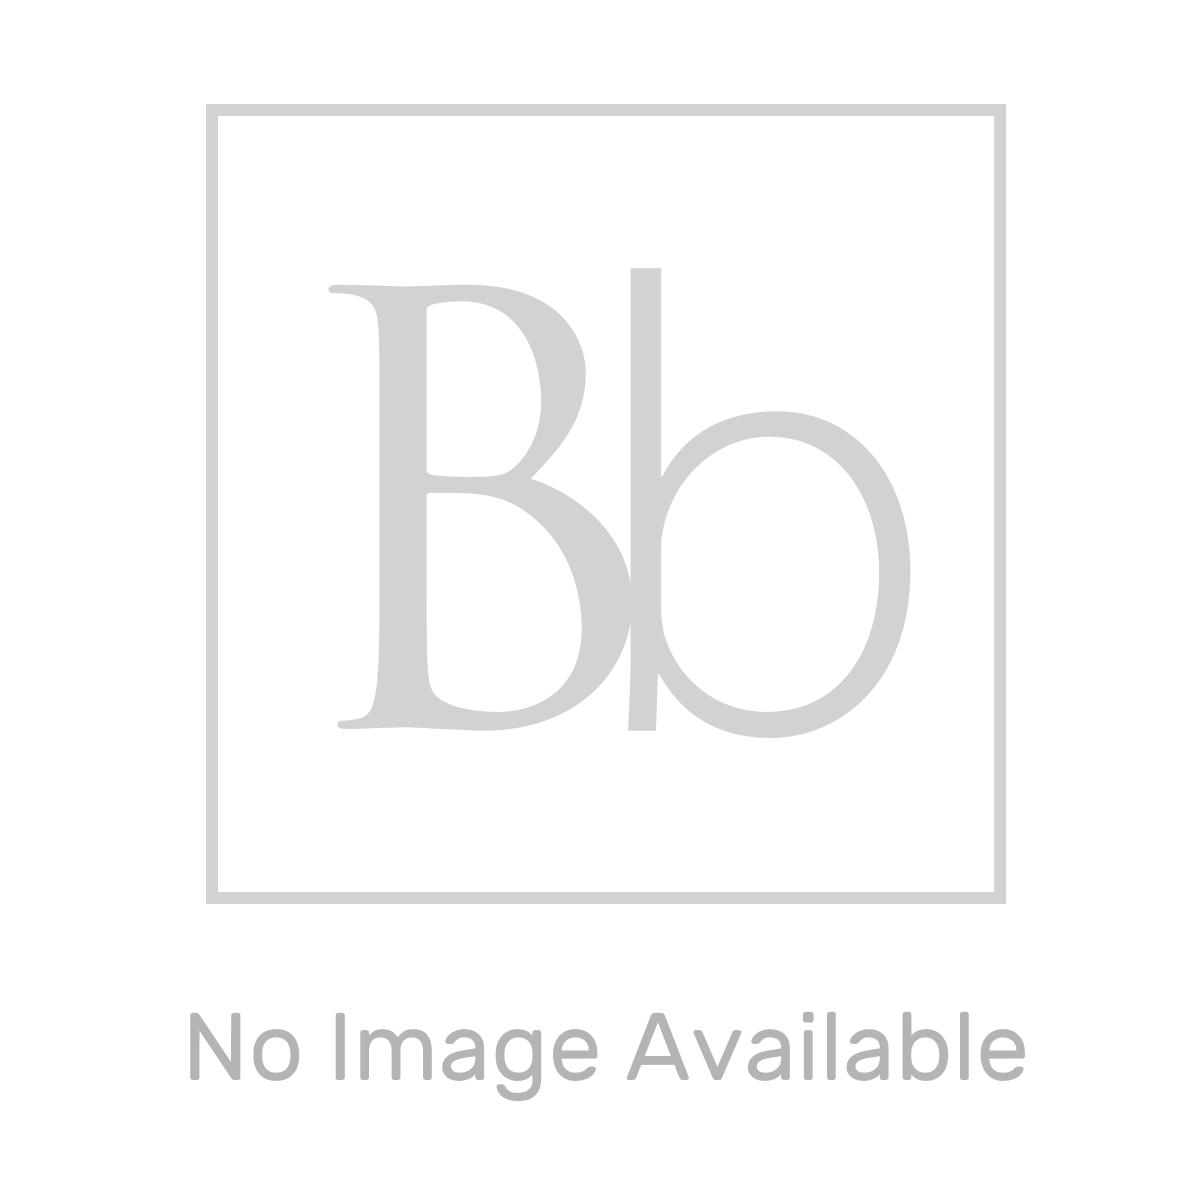 April Identiti 8 Wet Room Shower Enclosure with Flipper Panel